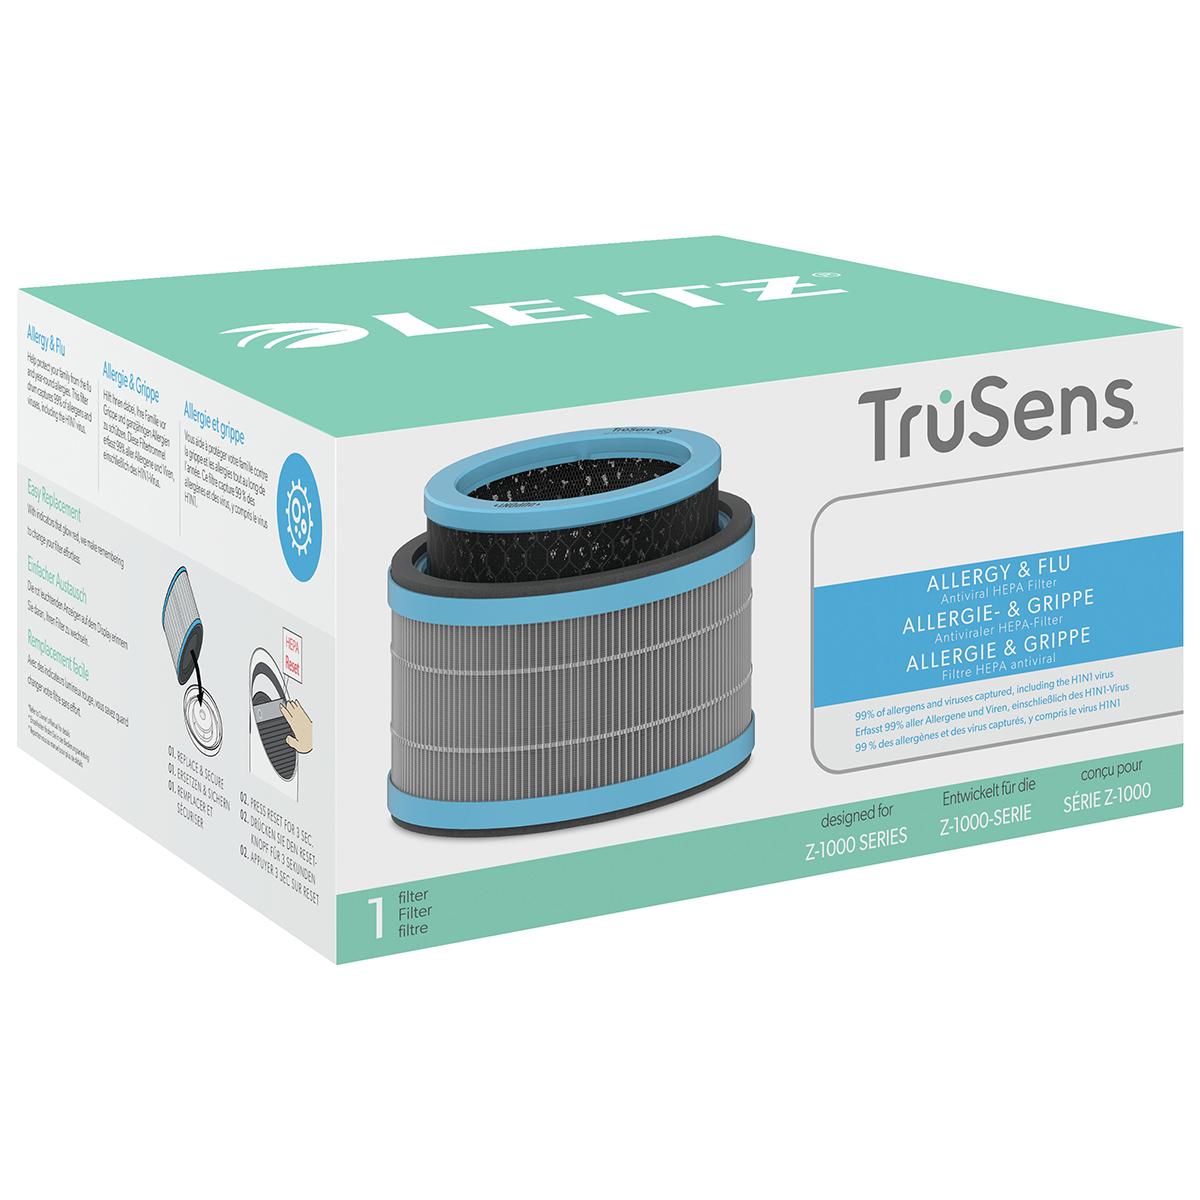 Leitz TruSens Z-1000 Allergy and Flu Anti-viral 3-in-1 HEPA Filter Drum